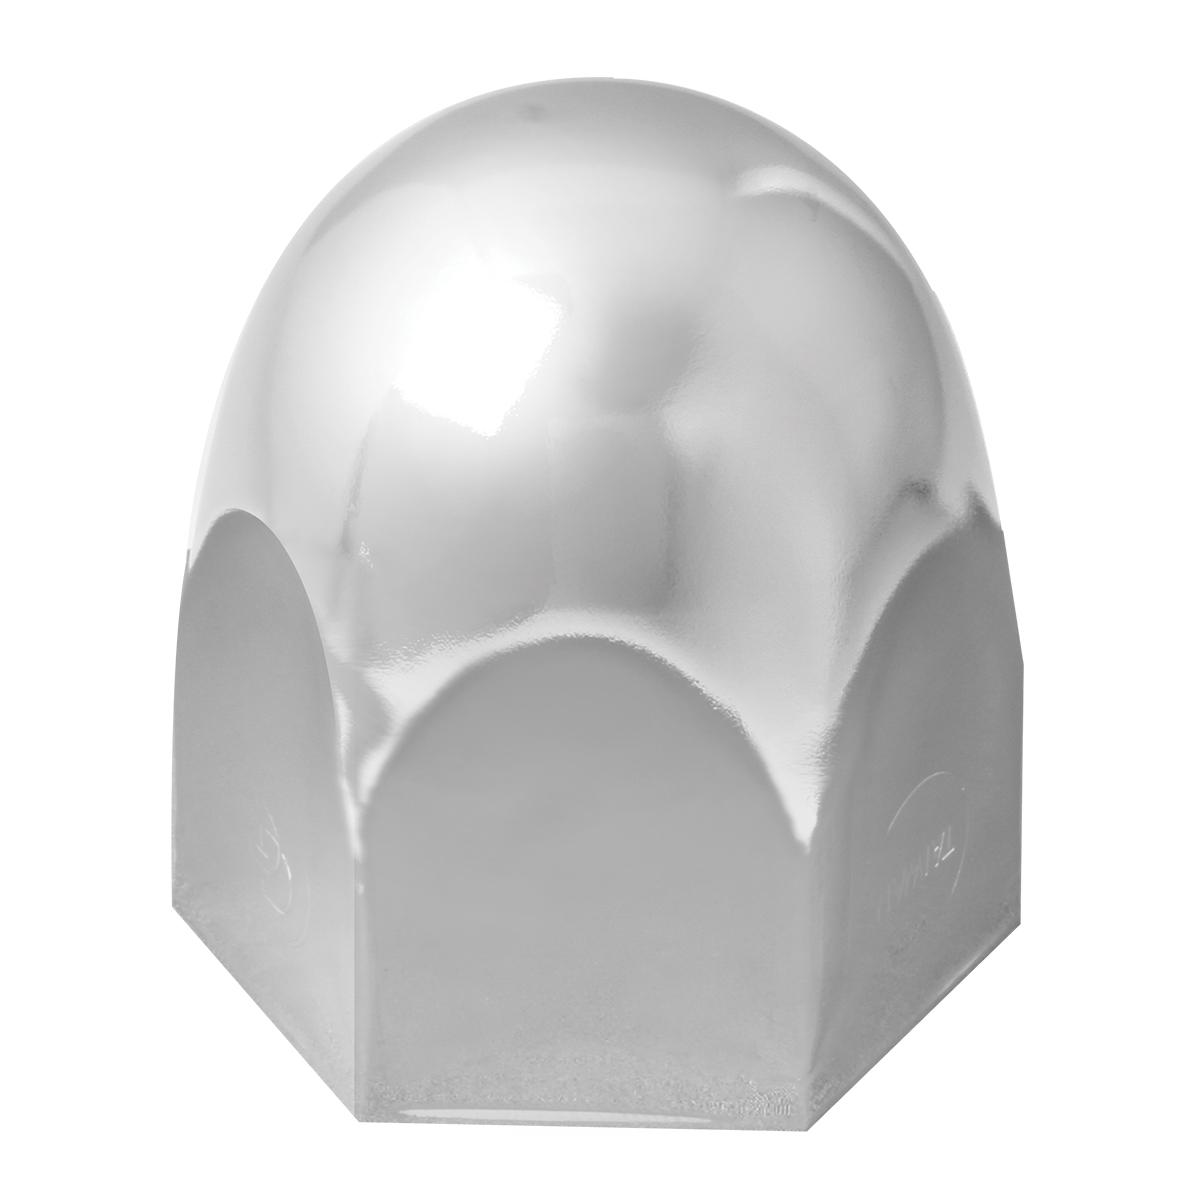 10220 Chrome Push-On Standard Lug Nut Cover w/o Flange for Hino Trucks